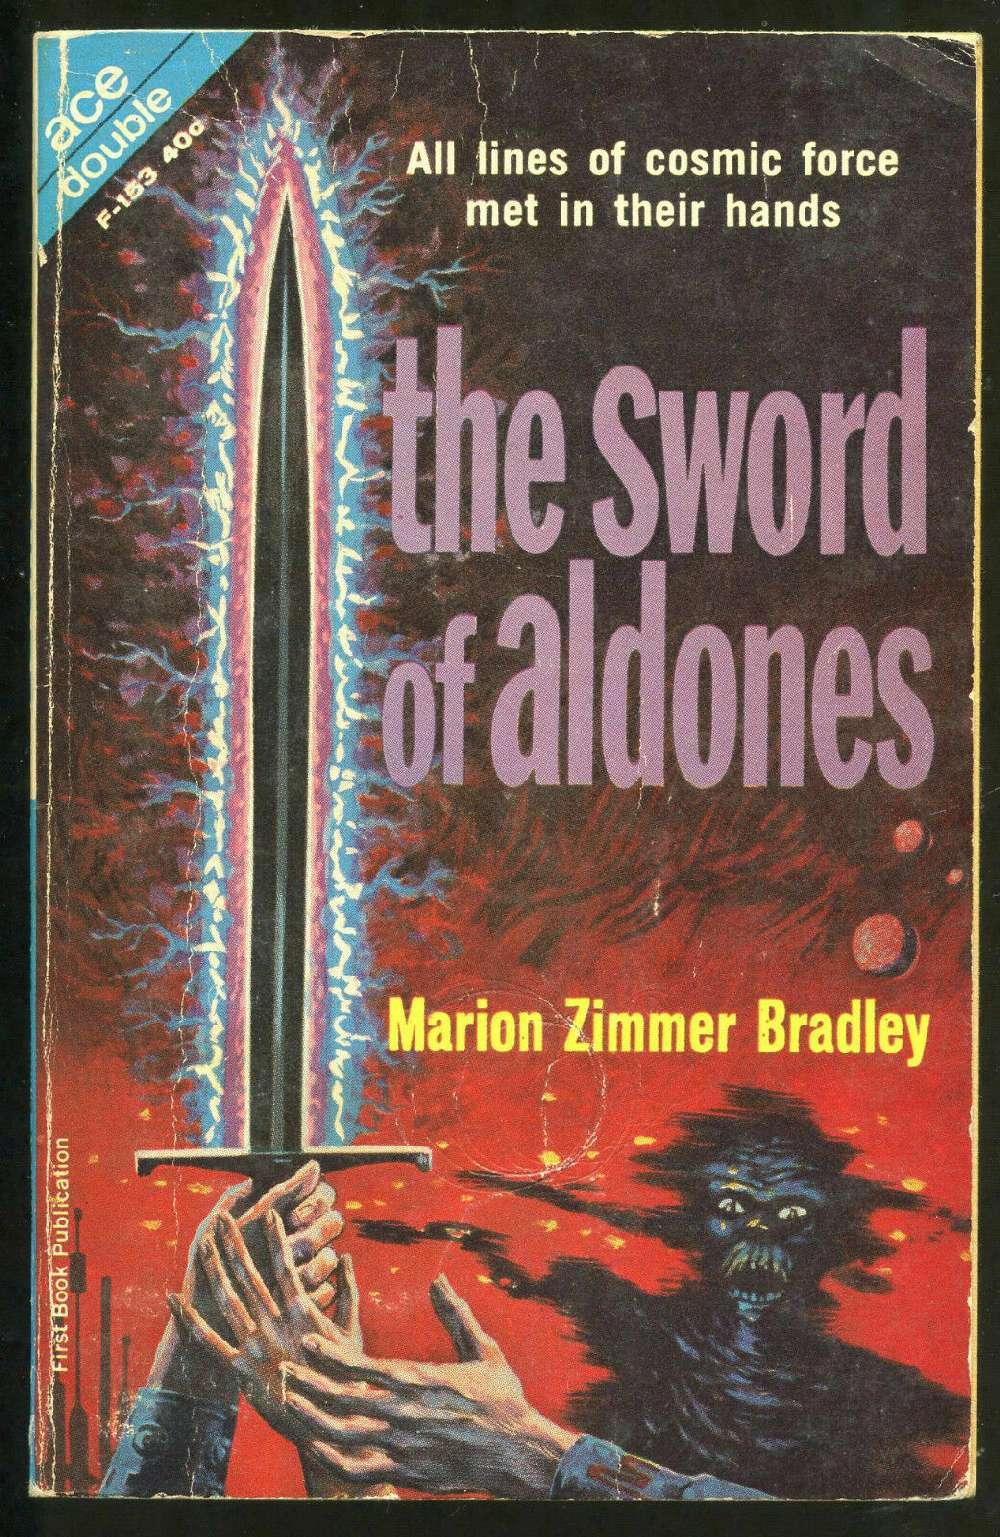 Art Direction: Just paint me a sword. A big fucking SWORD